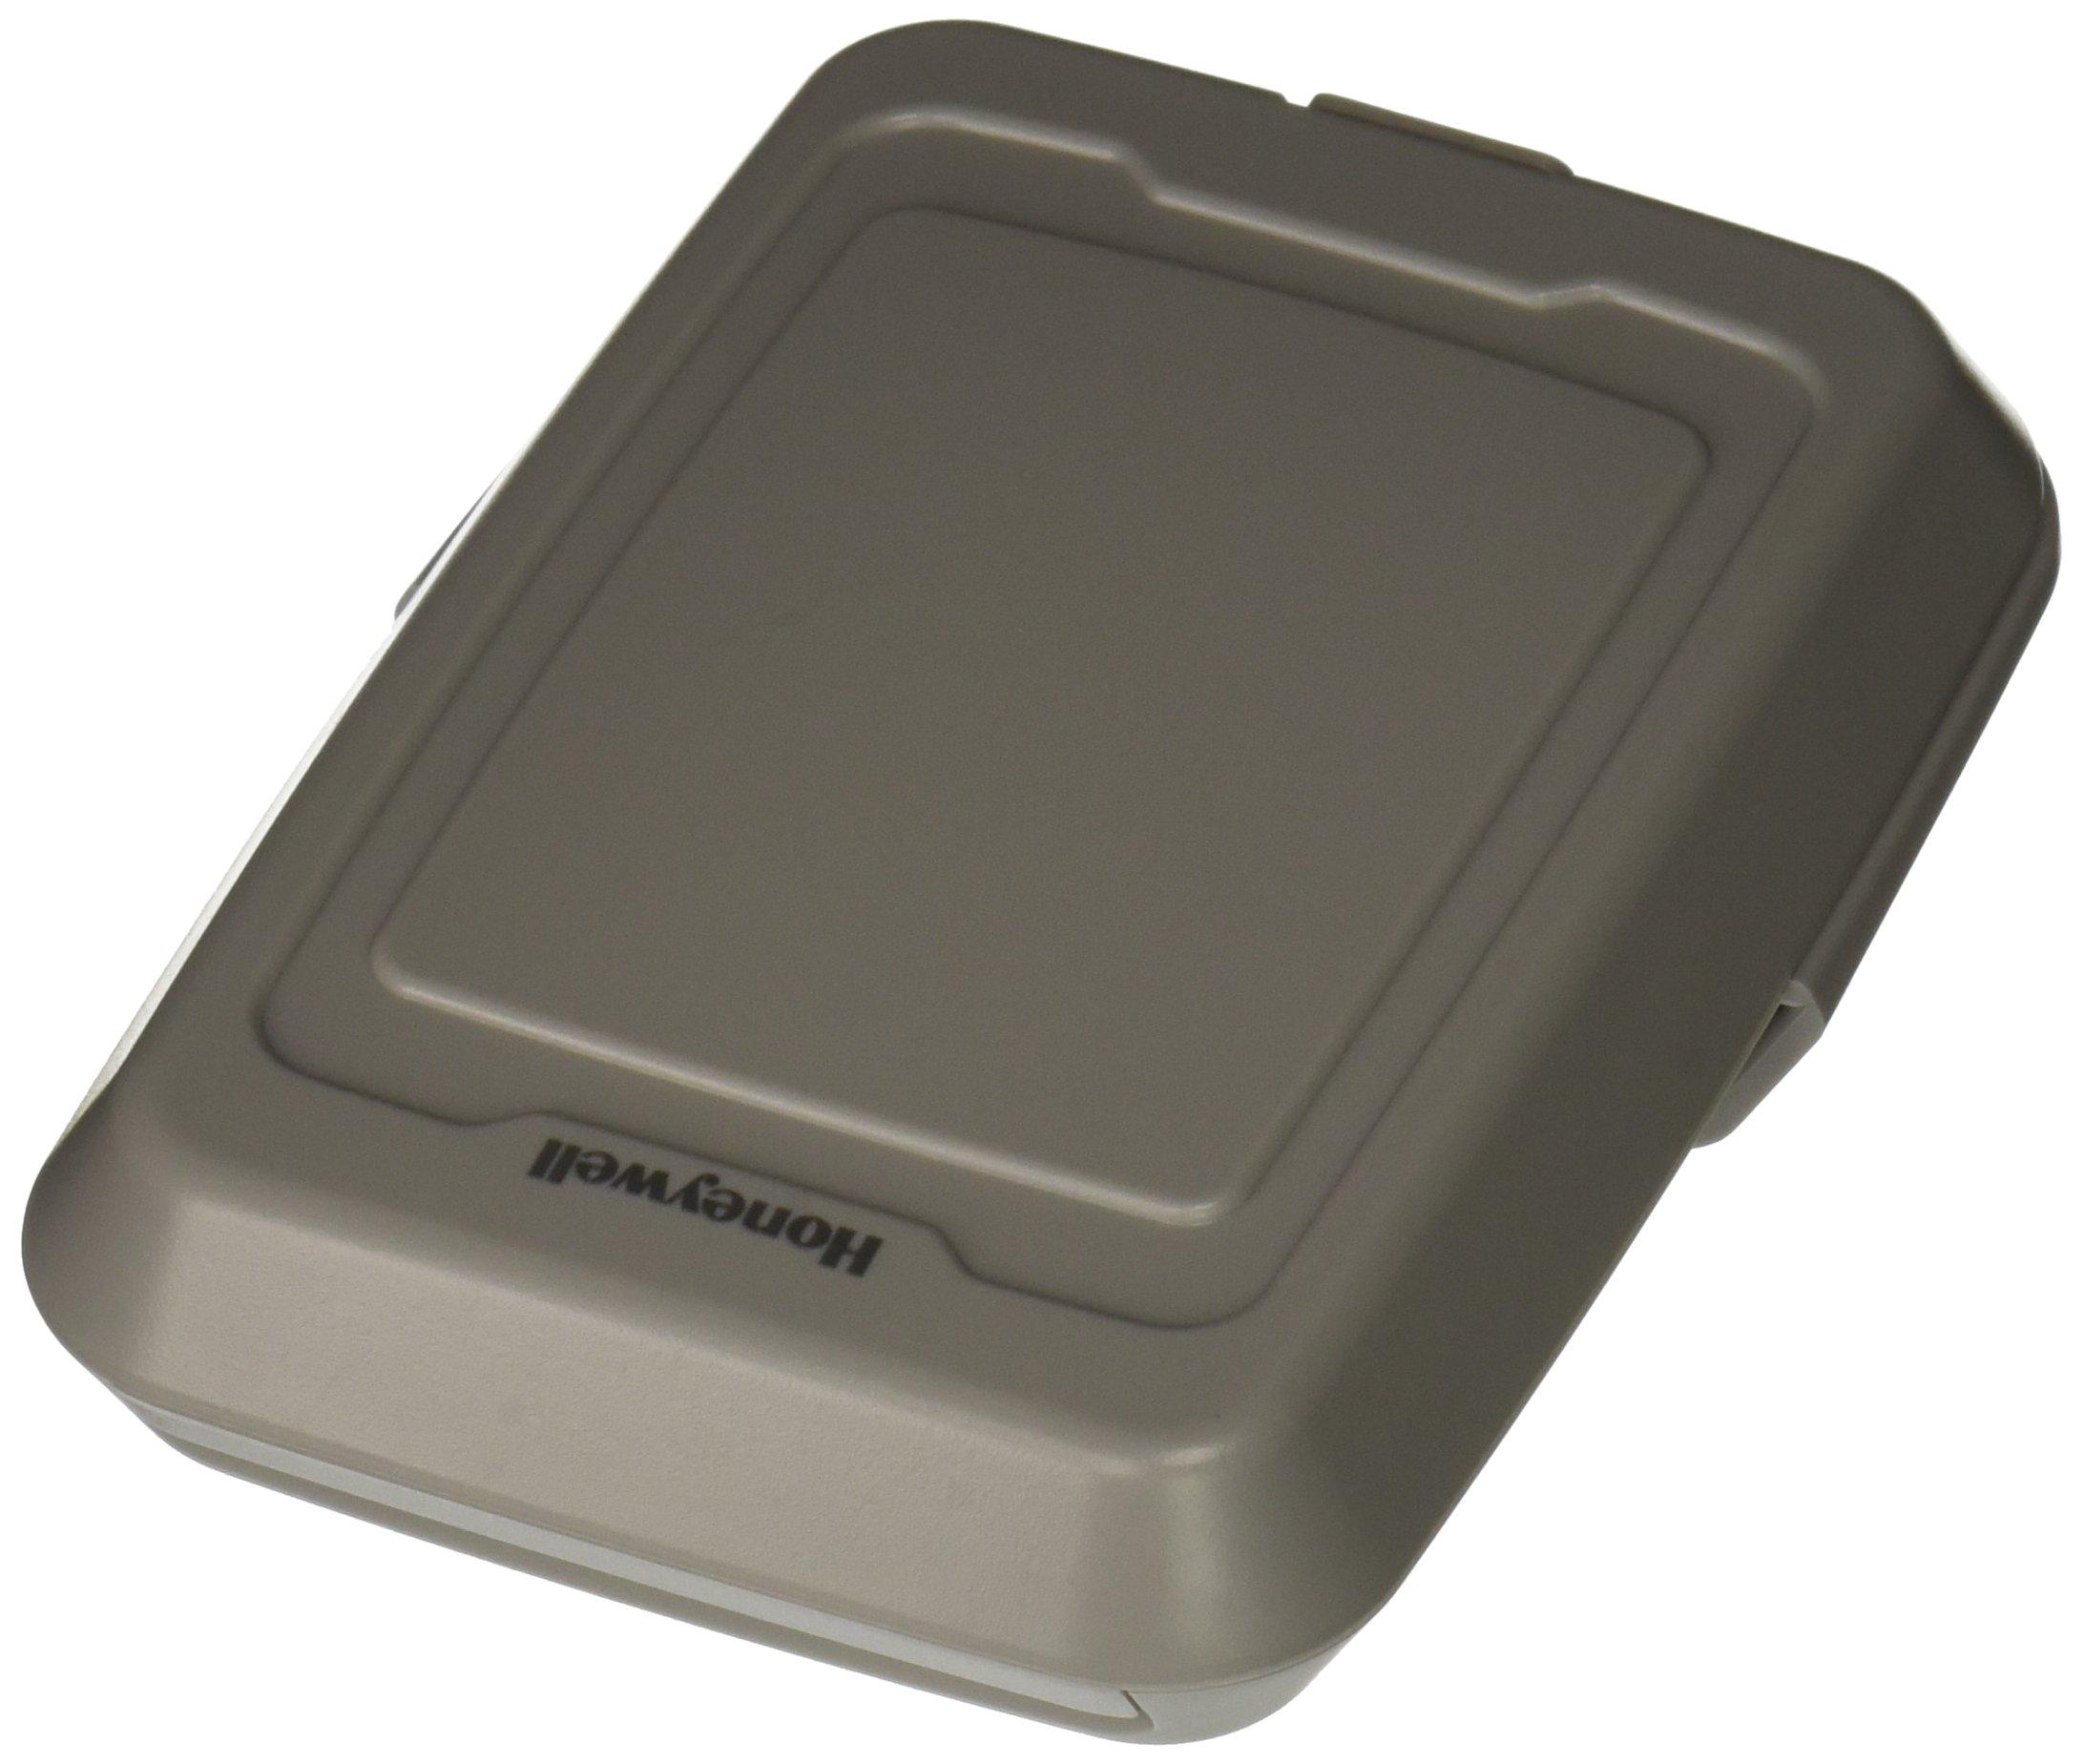 Honeywell C7089R1013 Wireless Outdoor Sensor